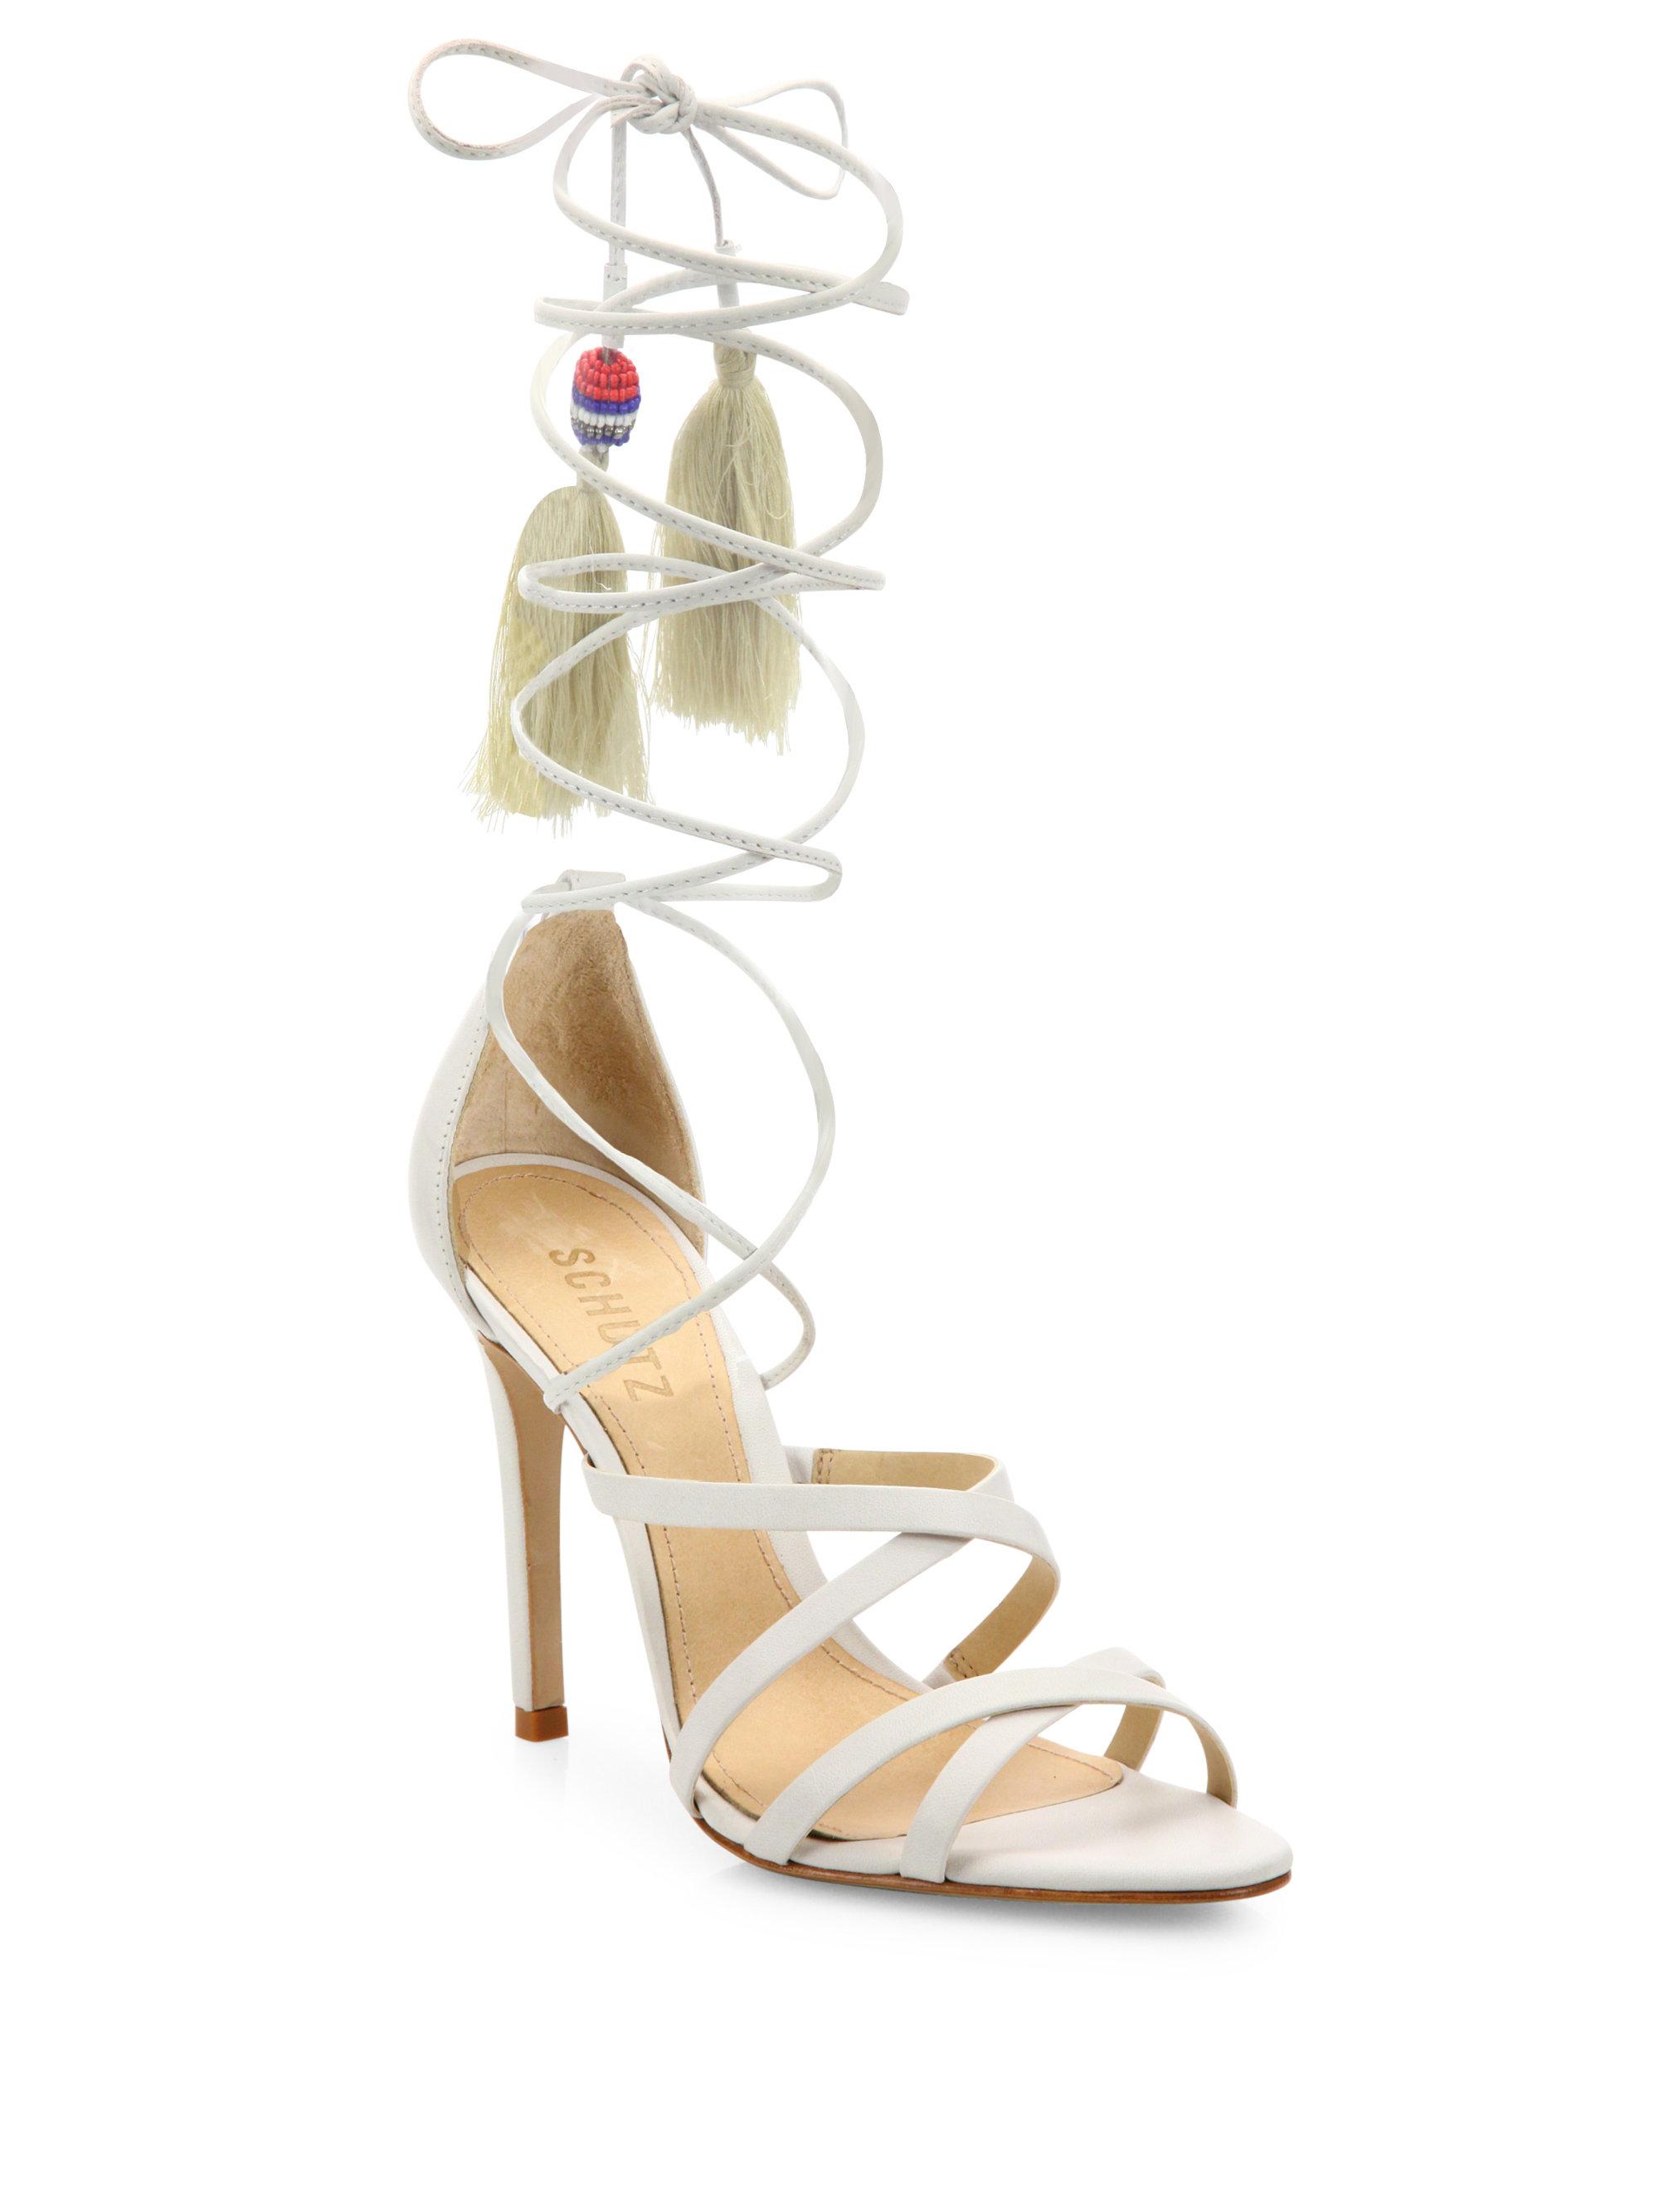 026167262fb Lyst - Schutz Kitty Wrap Leather Crisscross Sandals in White